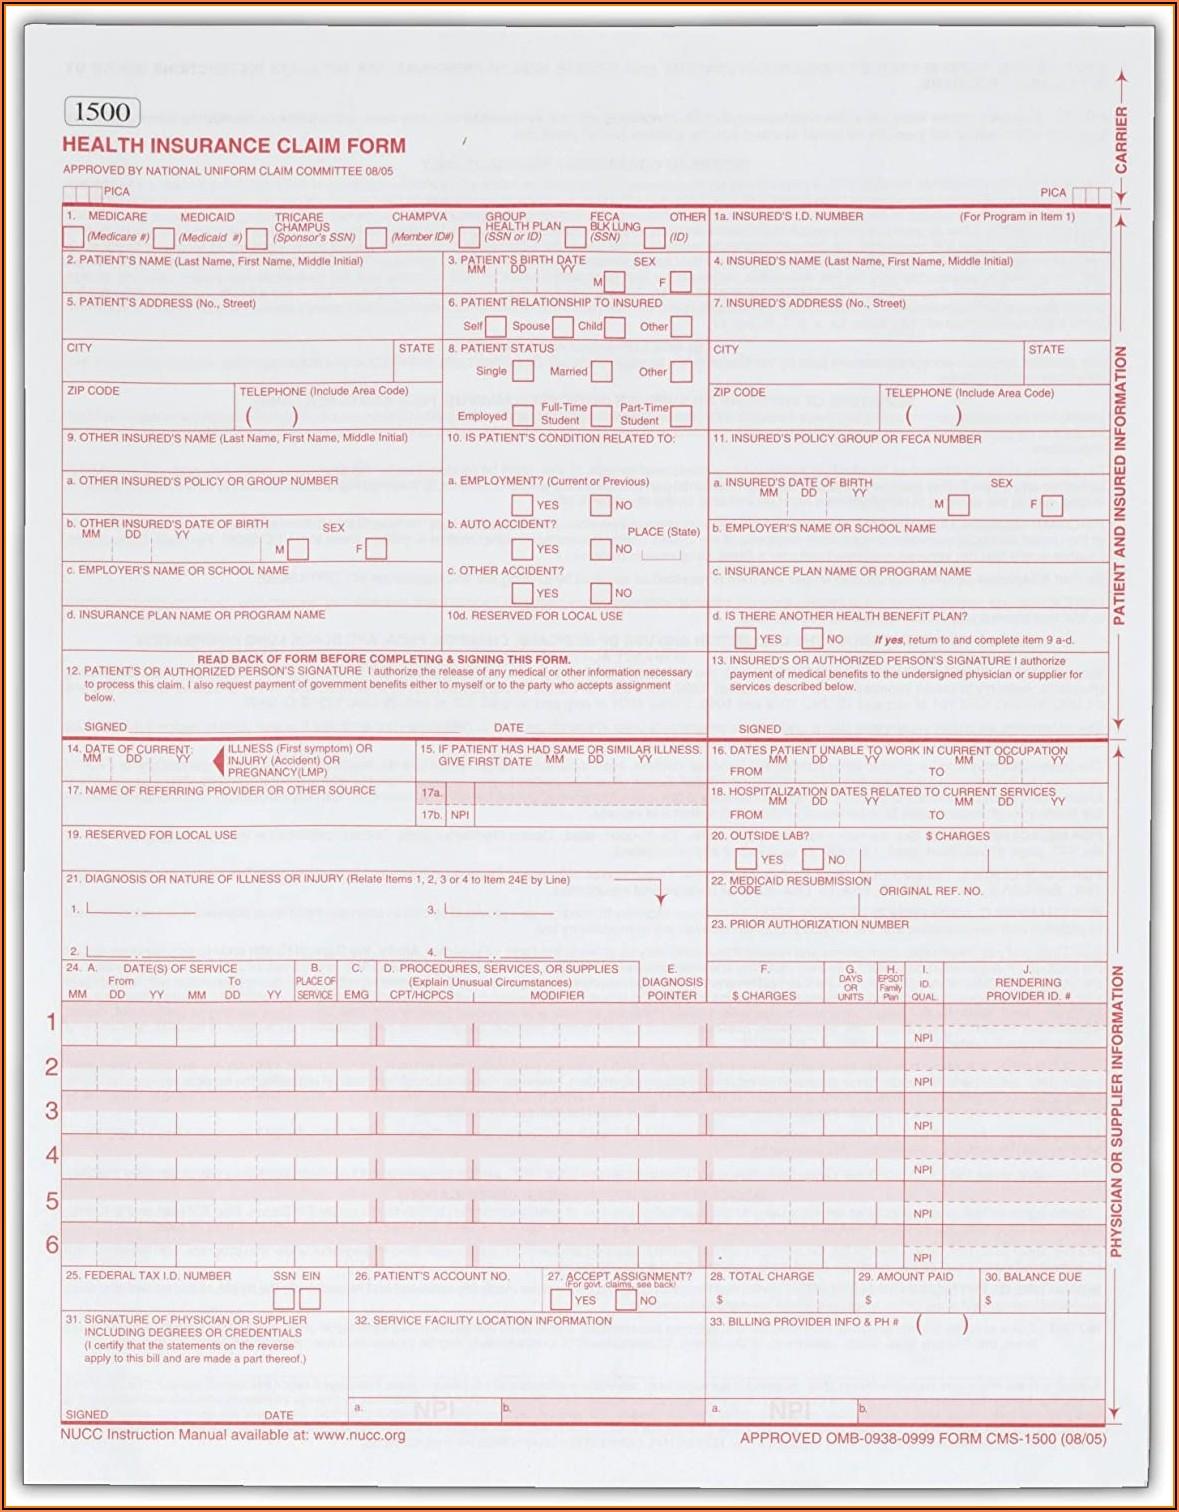 1500 Insurance Claim Form